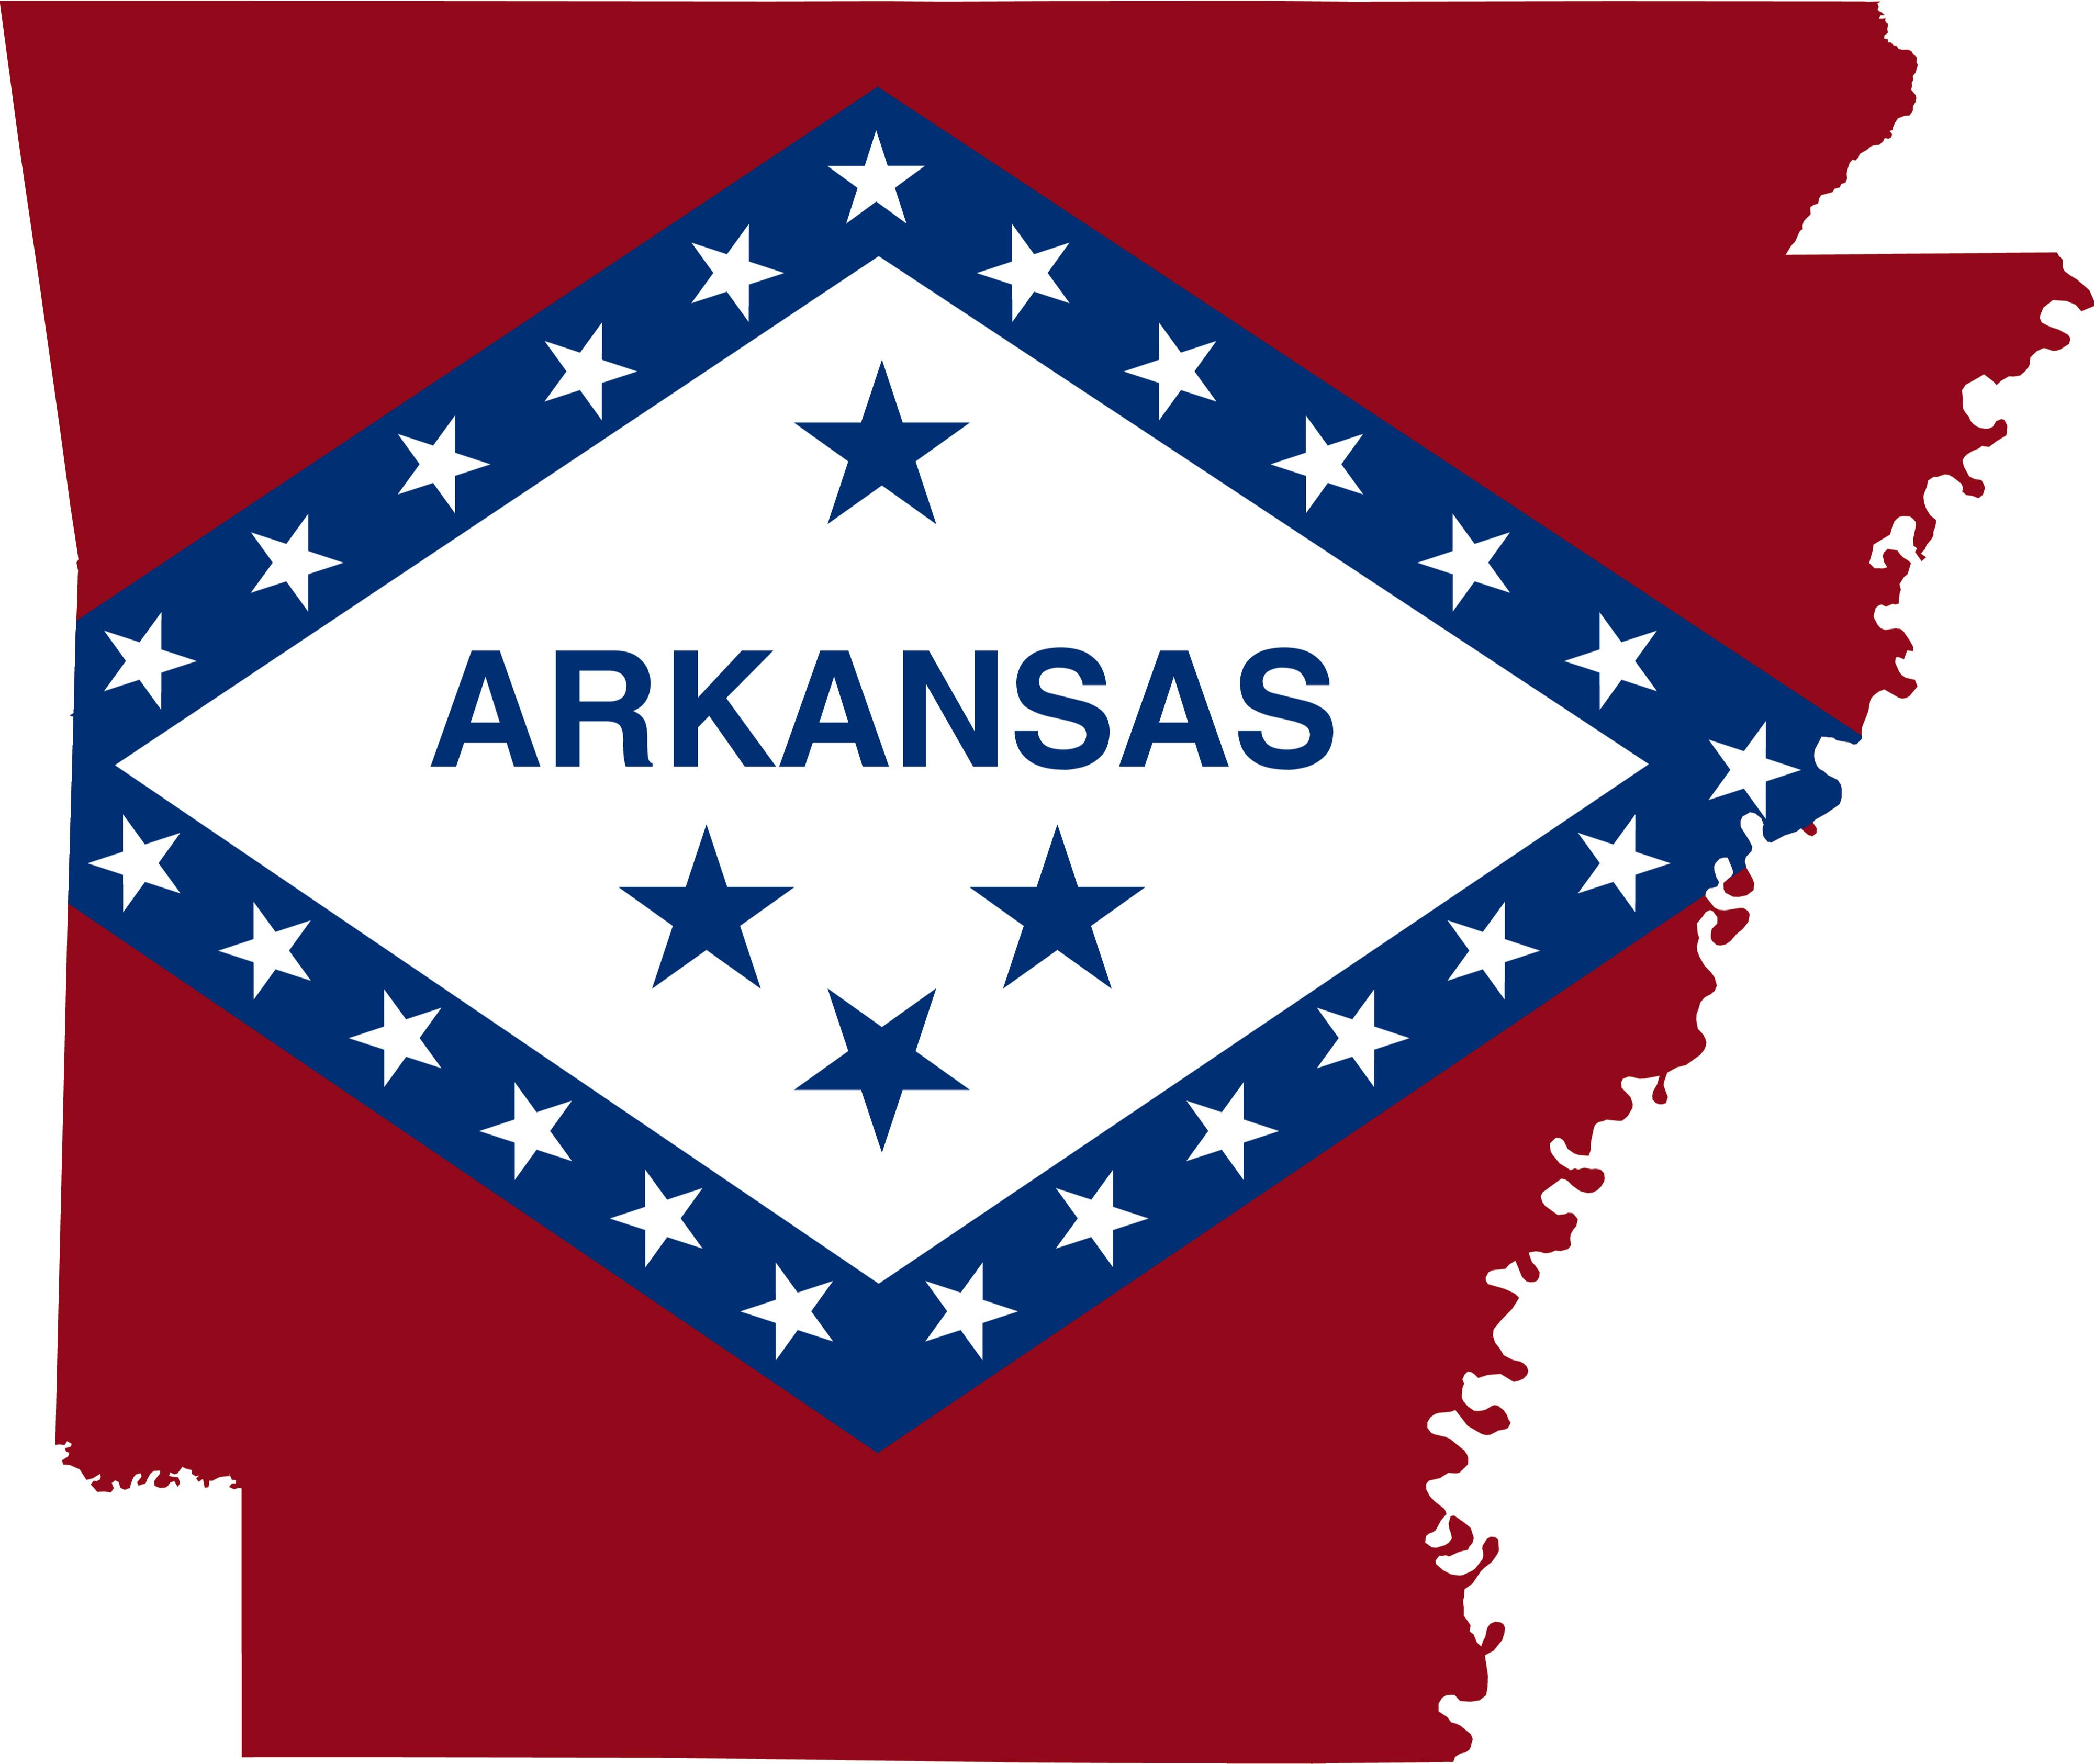 Arkansas Architect Continuing Education Requirements